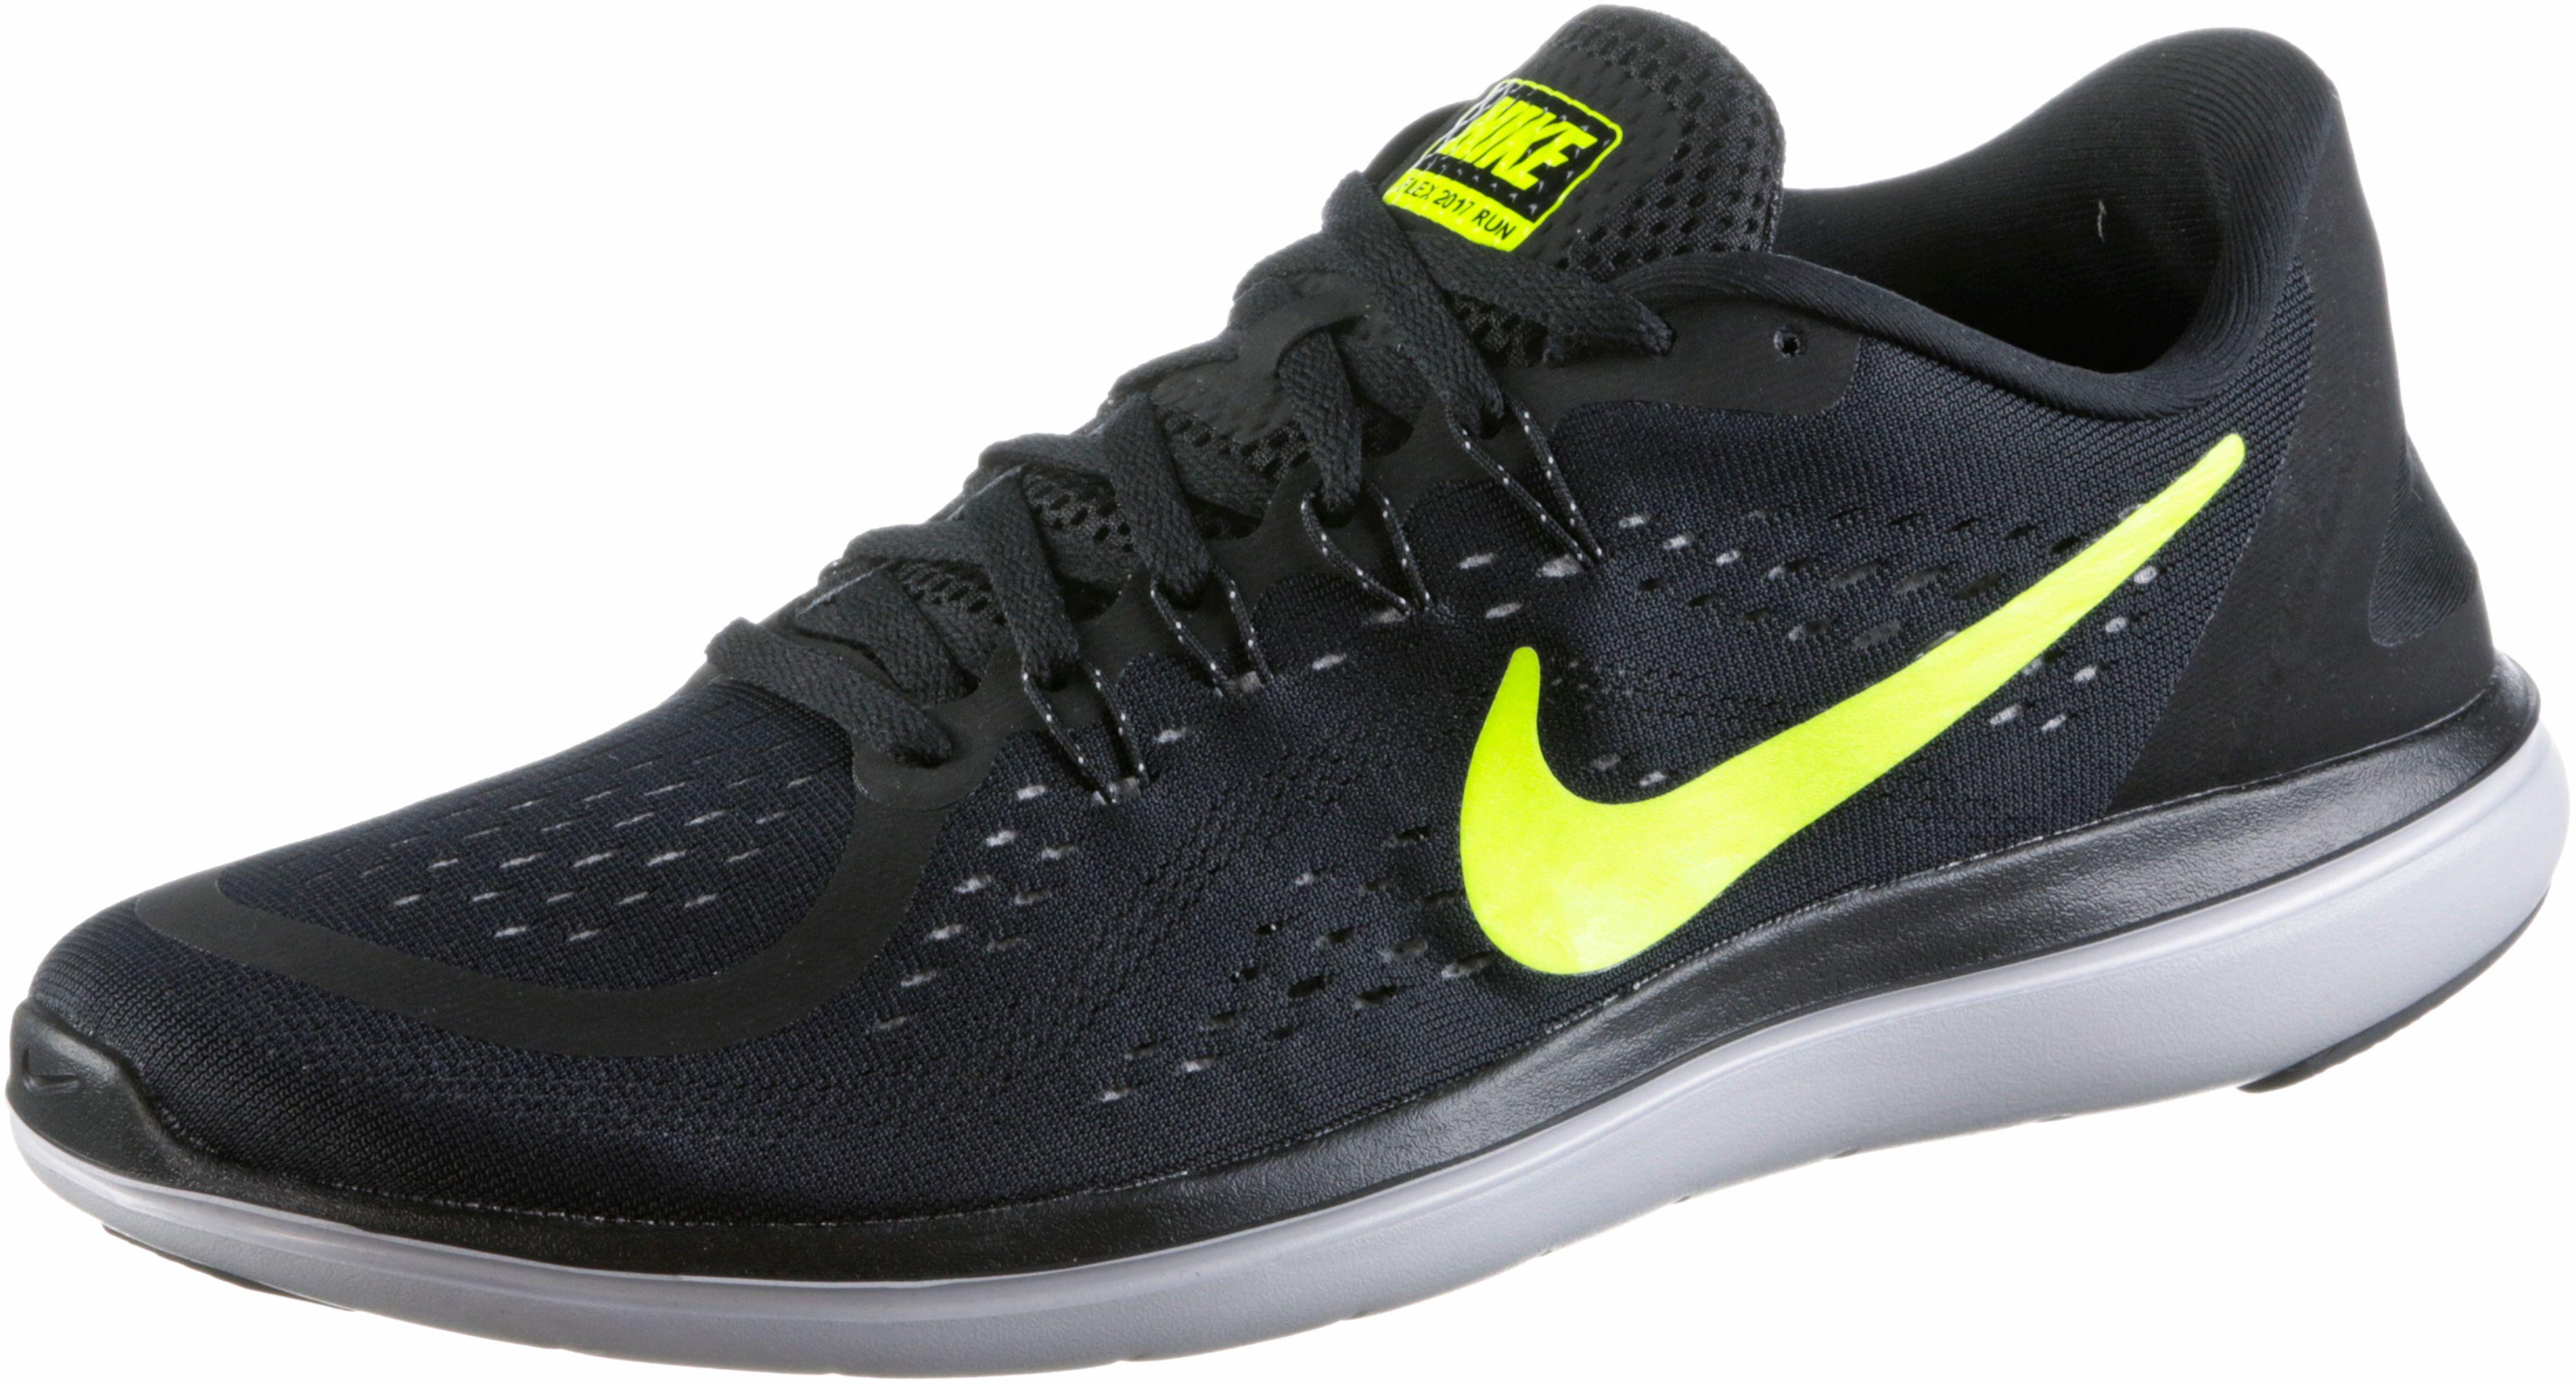 Nike ZOOM STRIKE Laufschuhe Damen, whitewolfgrey,Größen: 37 1/2, 38 1/2, 38, 39, 40, 40 1/2, 41, 42 1/2, 42